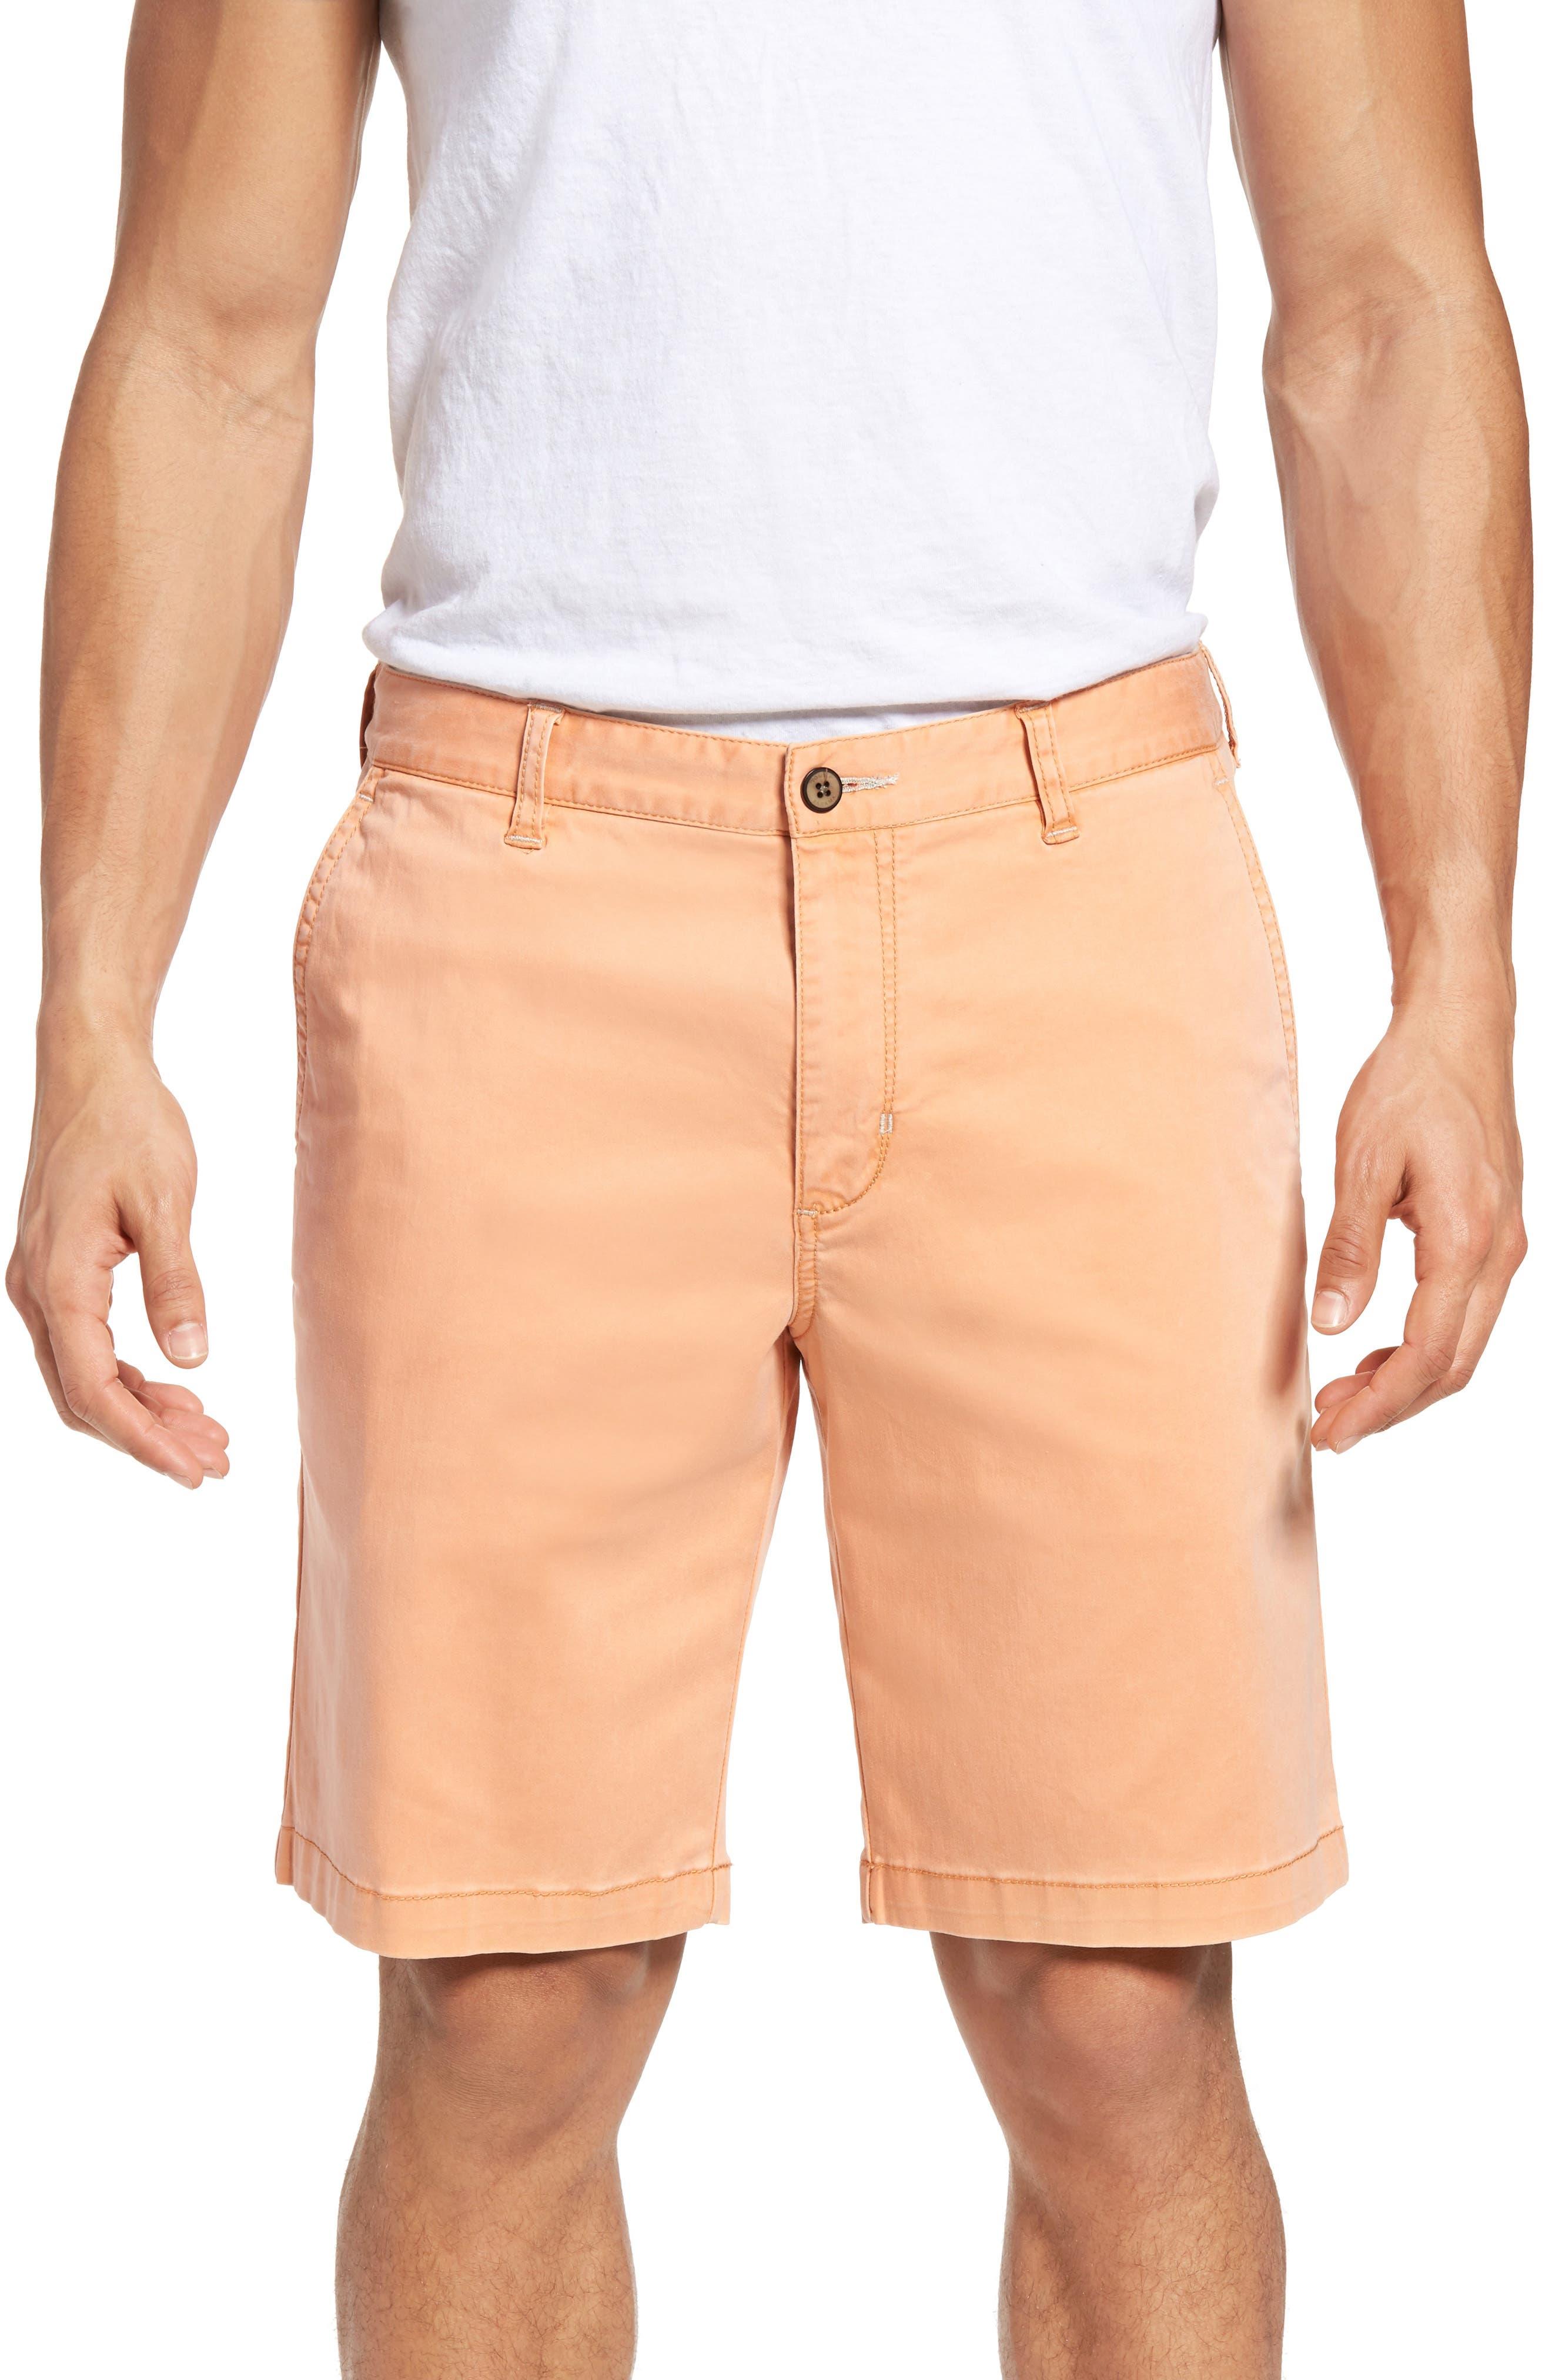 Boracay Chino Shorts,                             Main thumbnail 10, color,